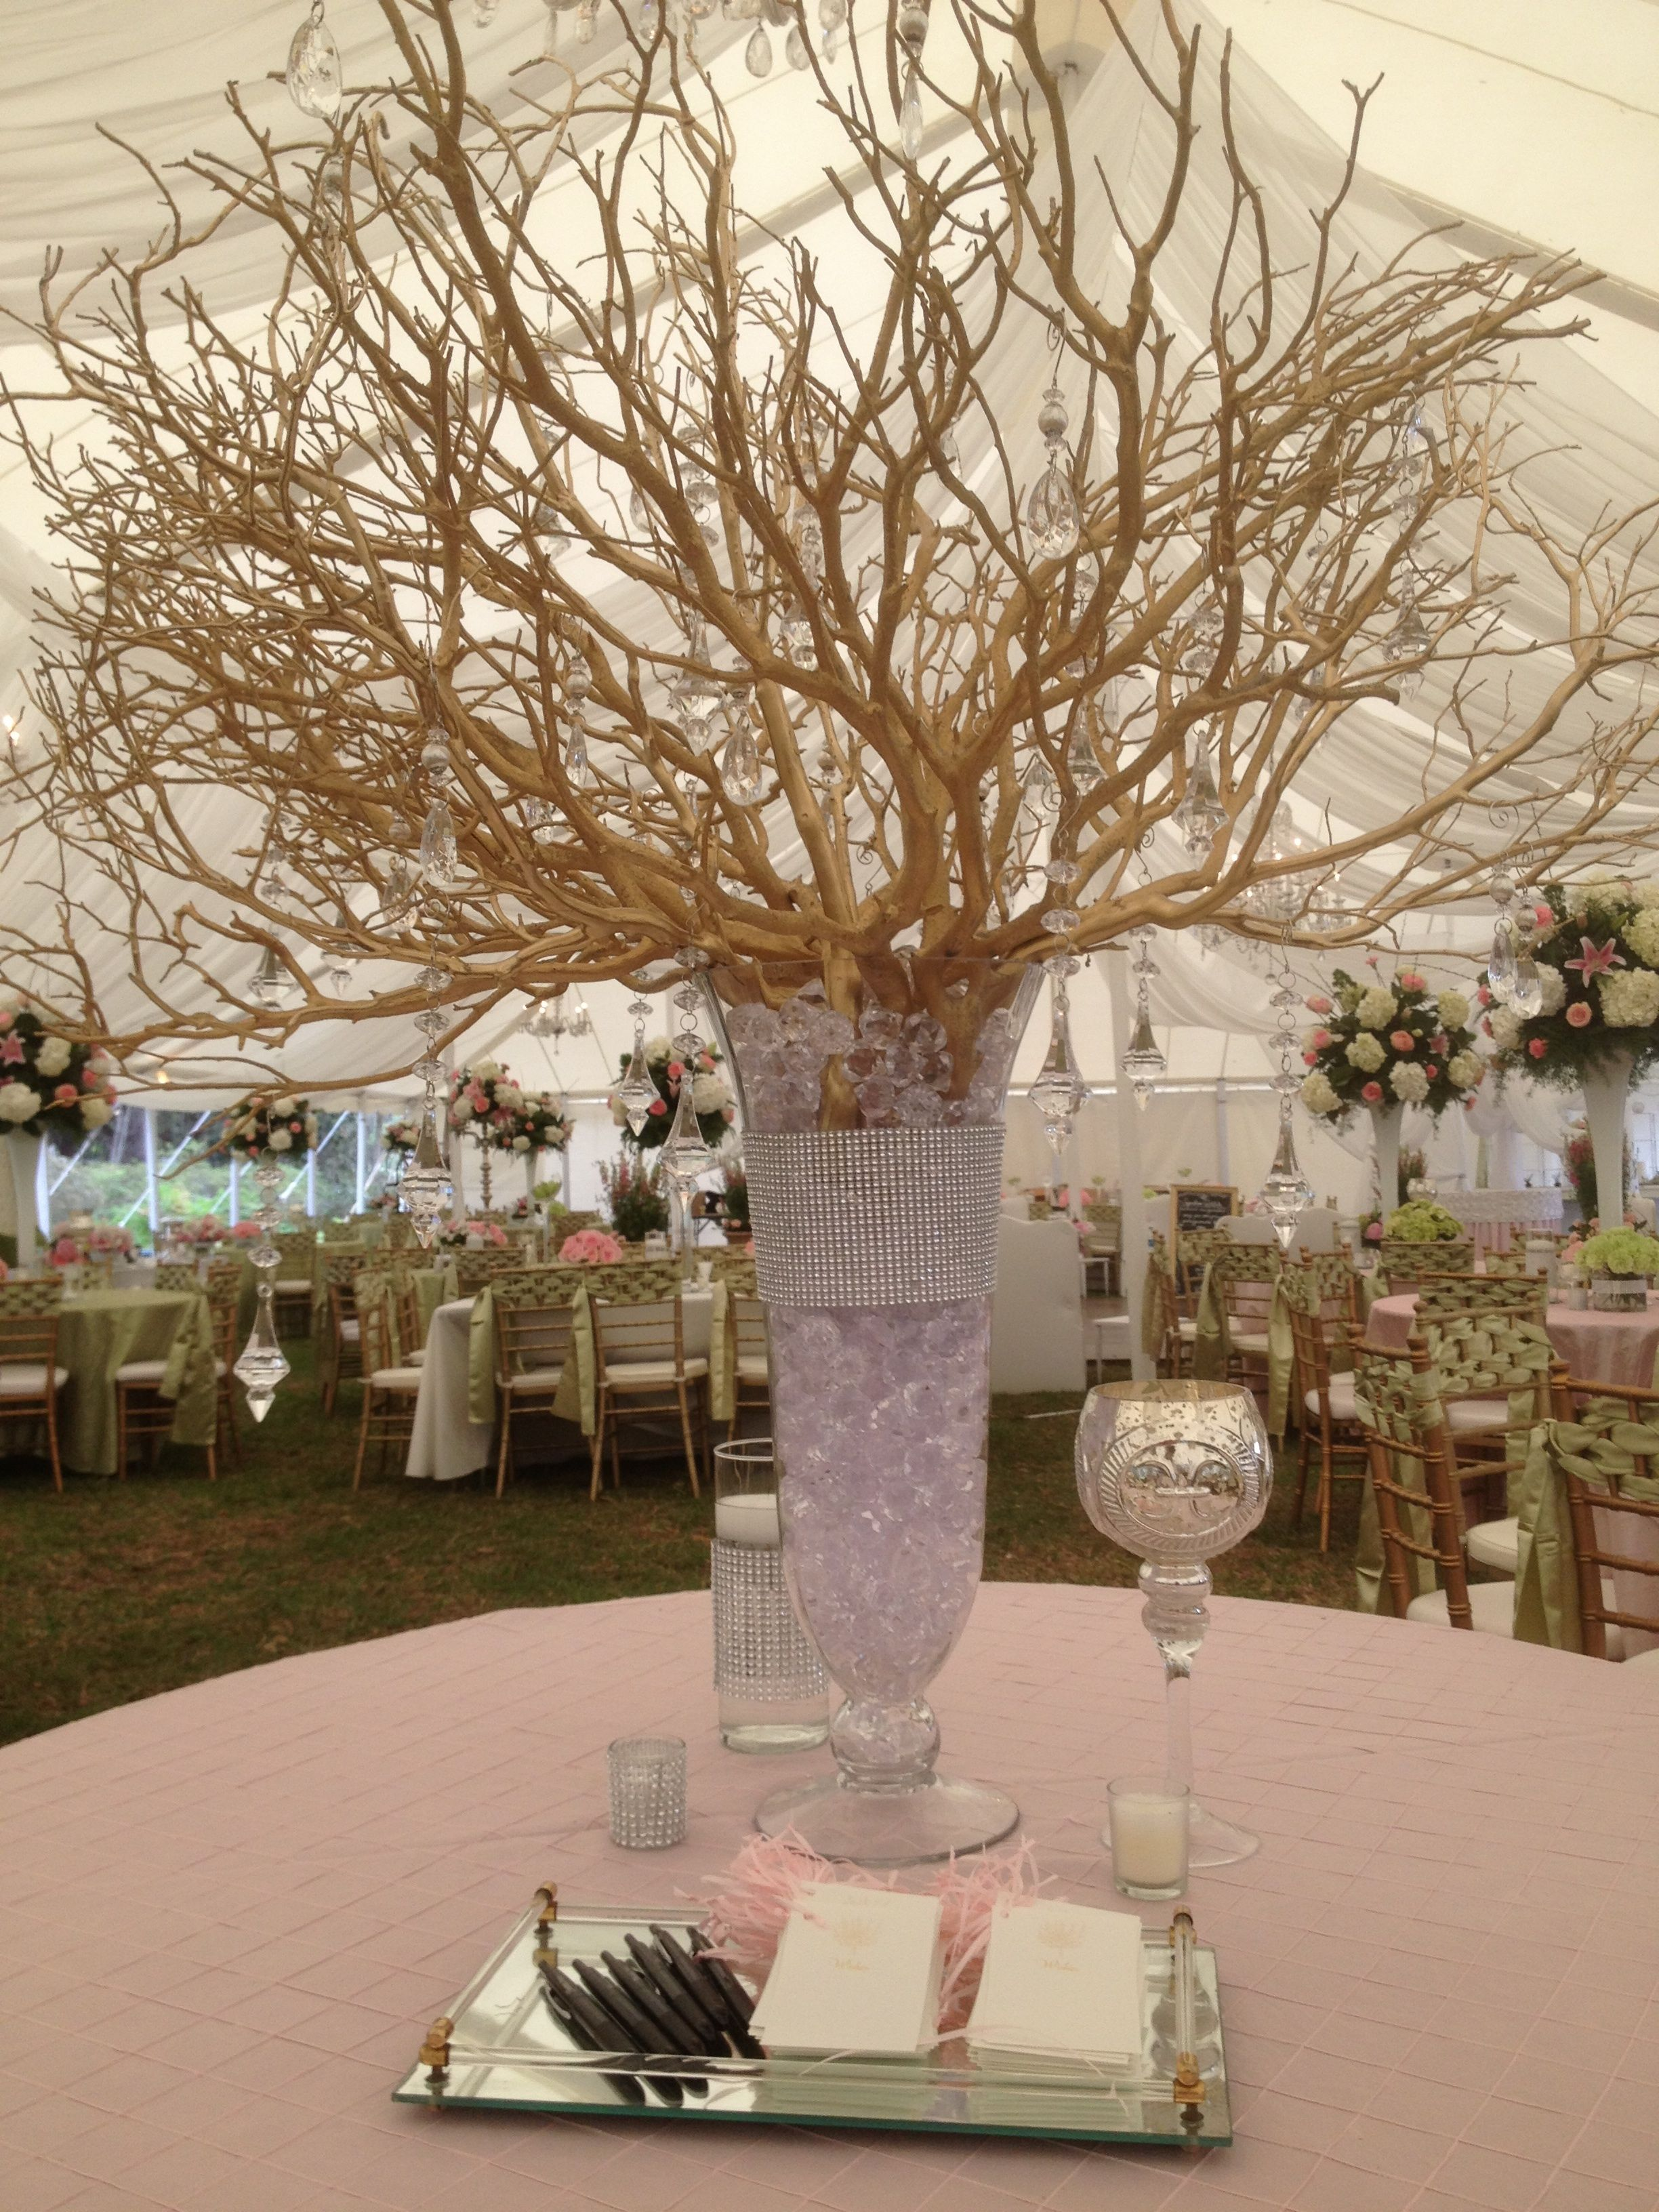 Wedding ideas decor wishing tree gold